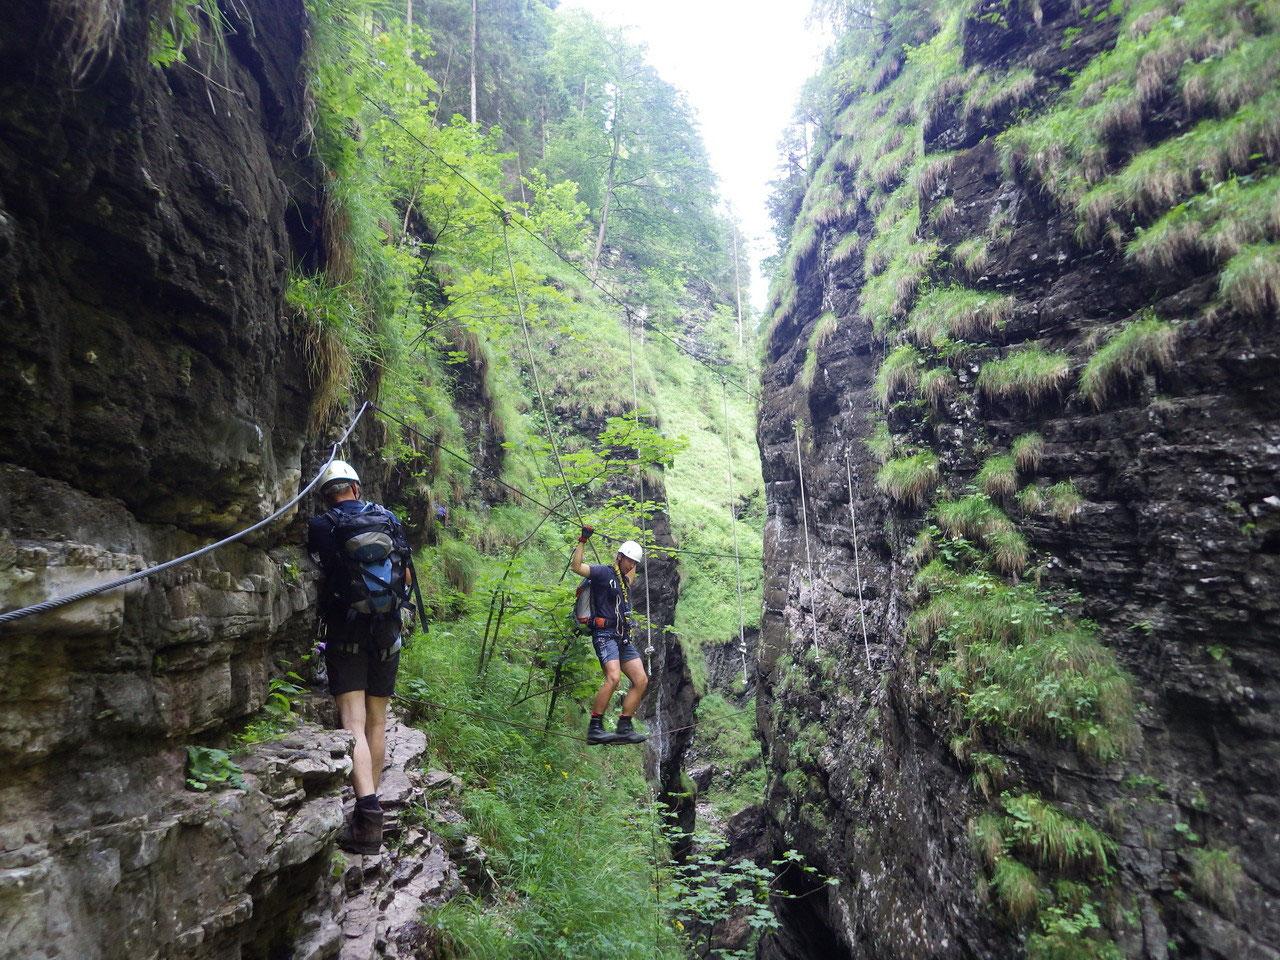 Klettersteig Quebec : Postalmklamm klettersteig olli outdoor travelling